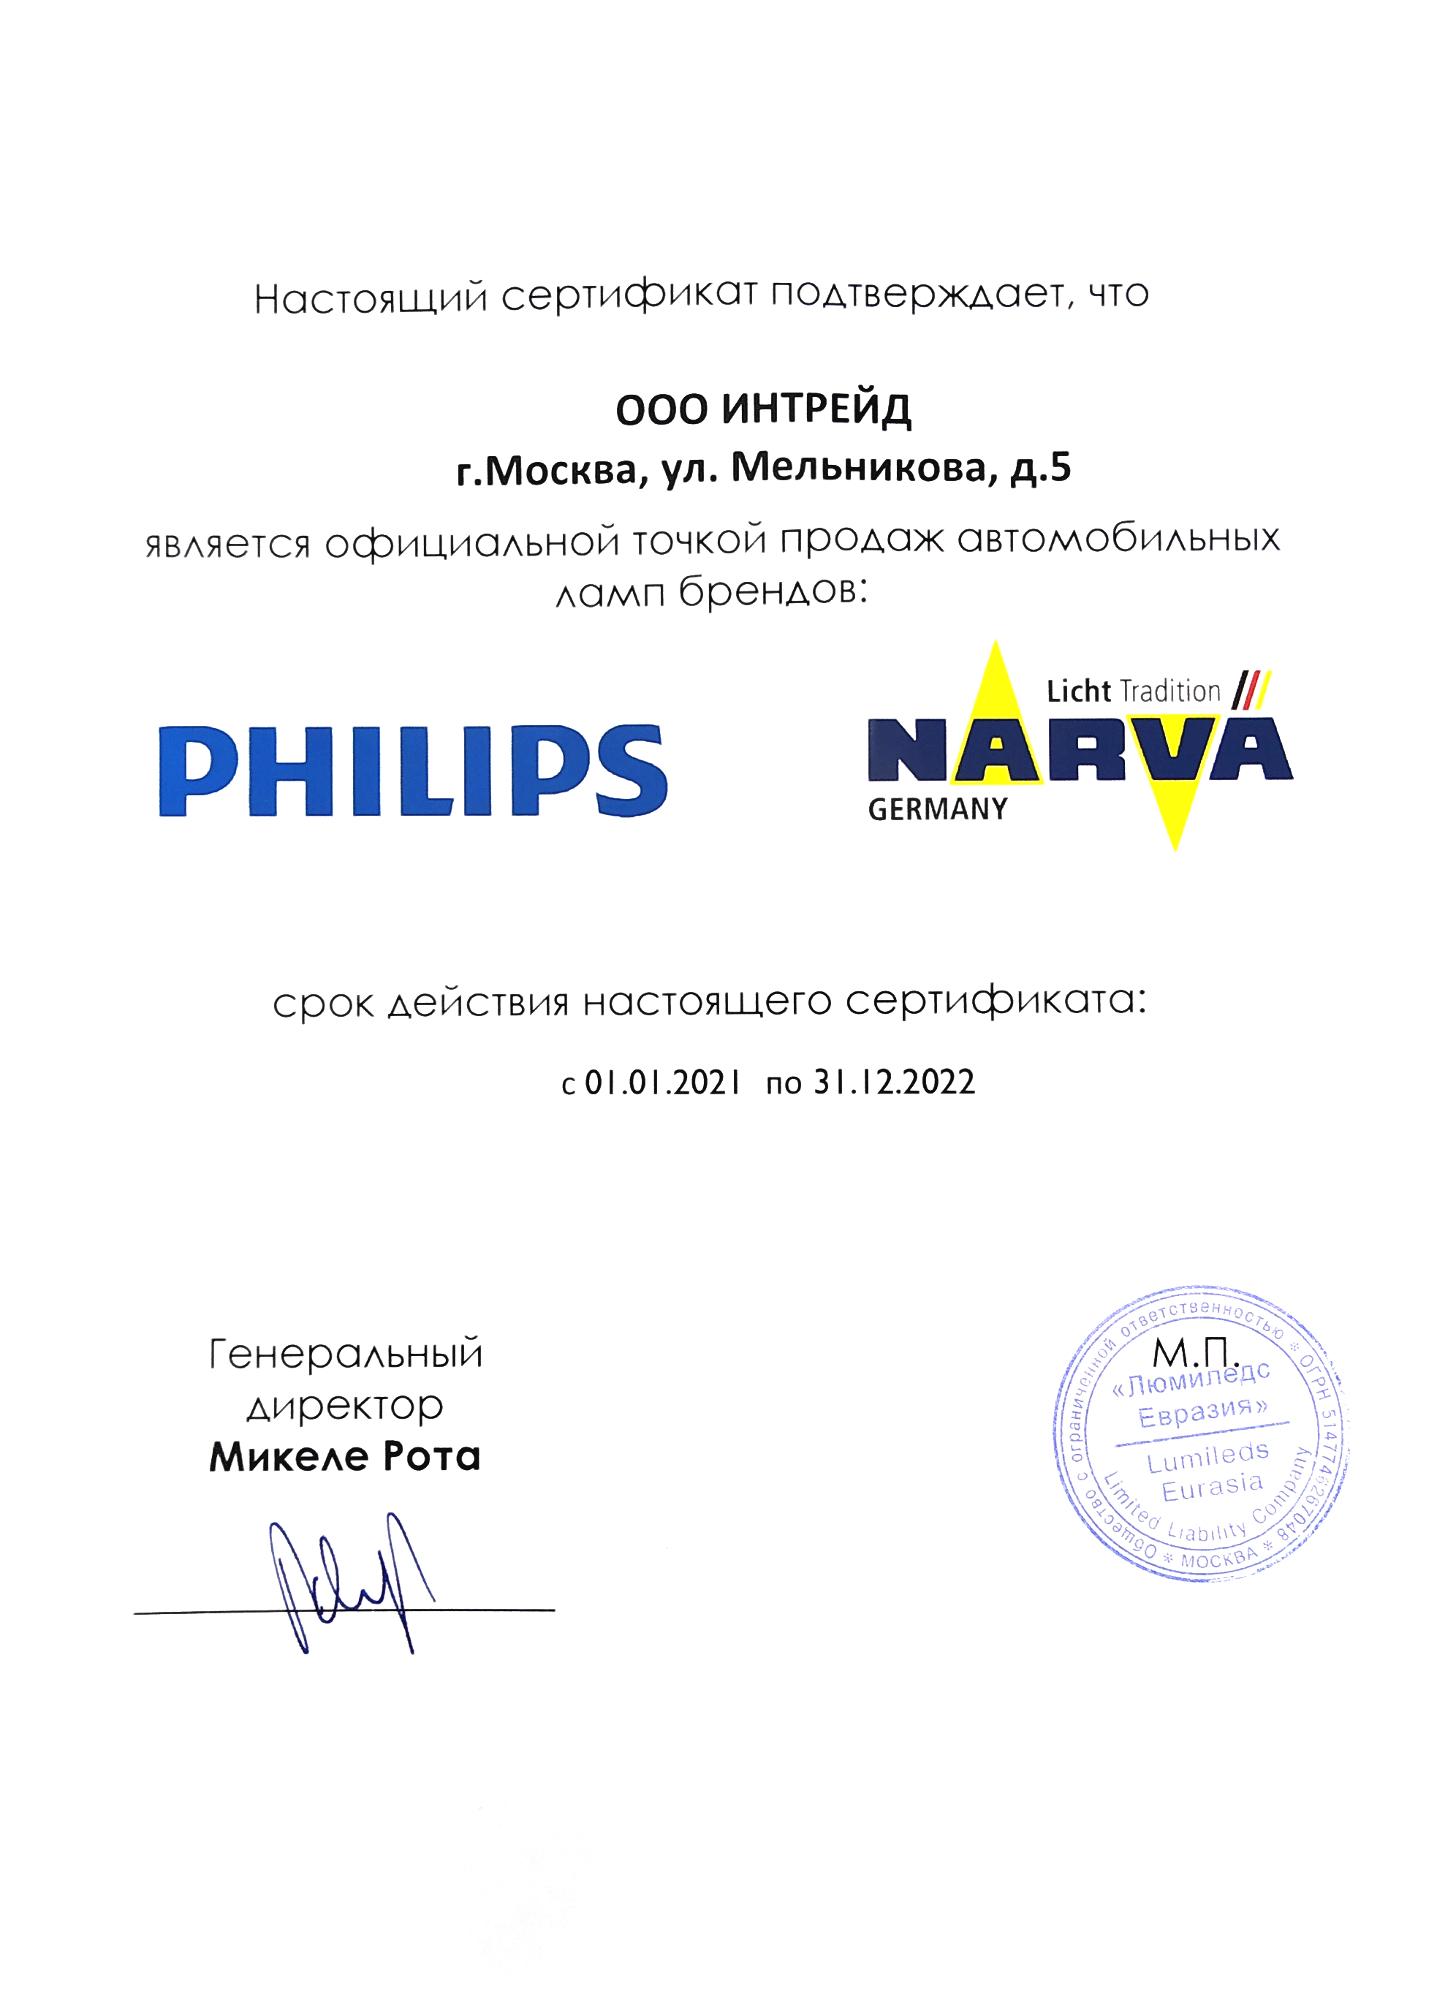 Сертификат дилера от Philips